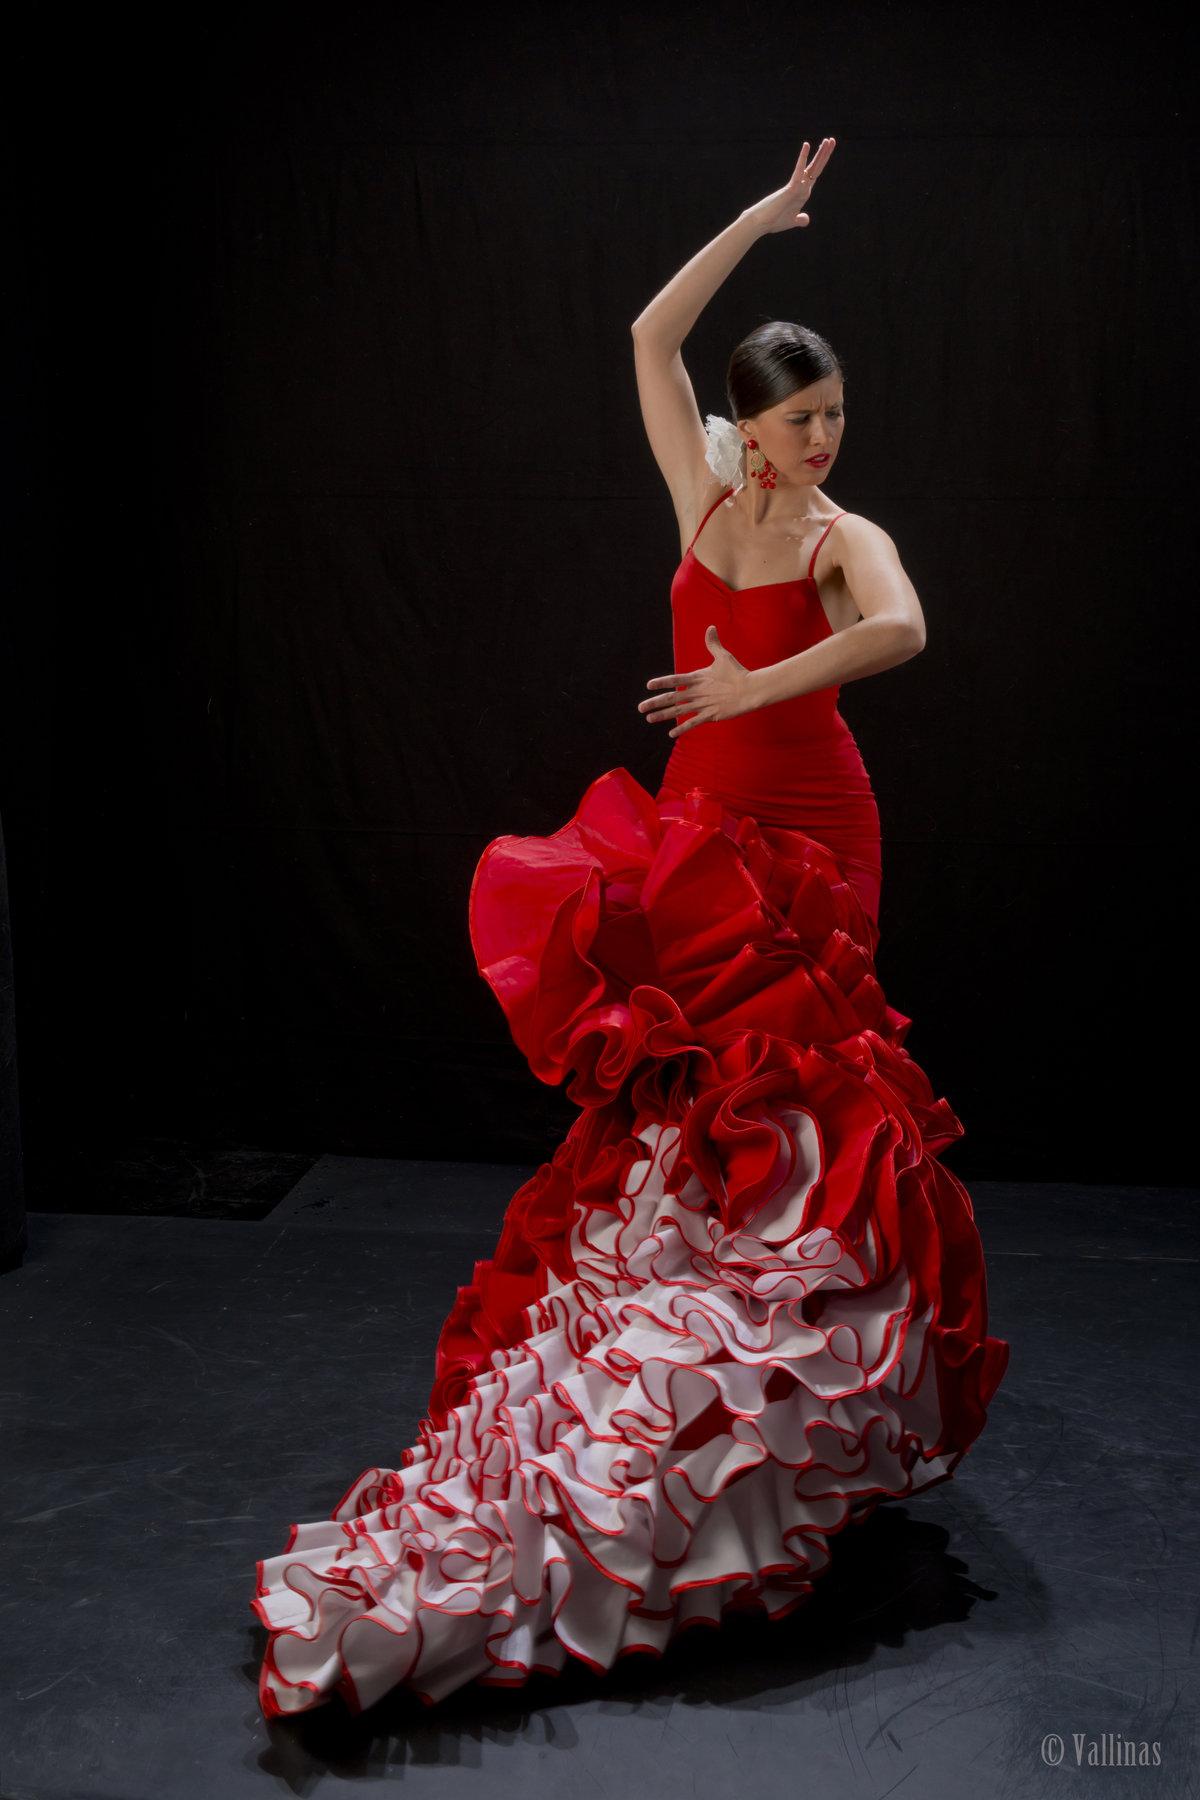 вроде танцовщица фламенко фото раздел